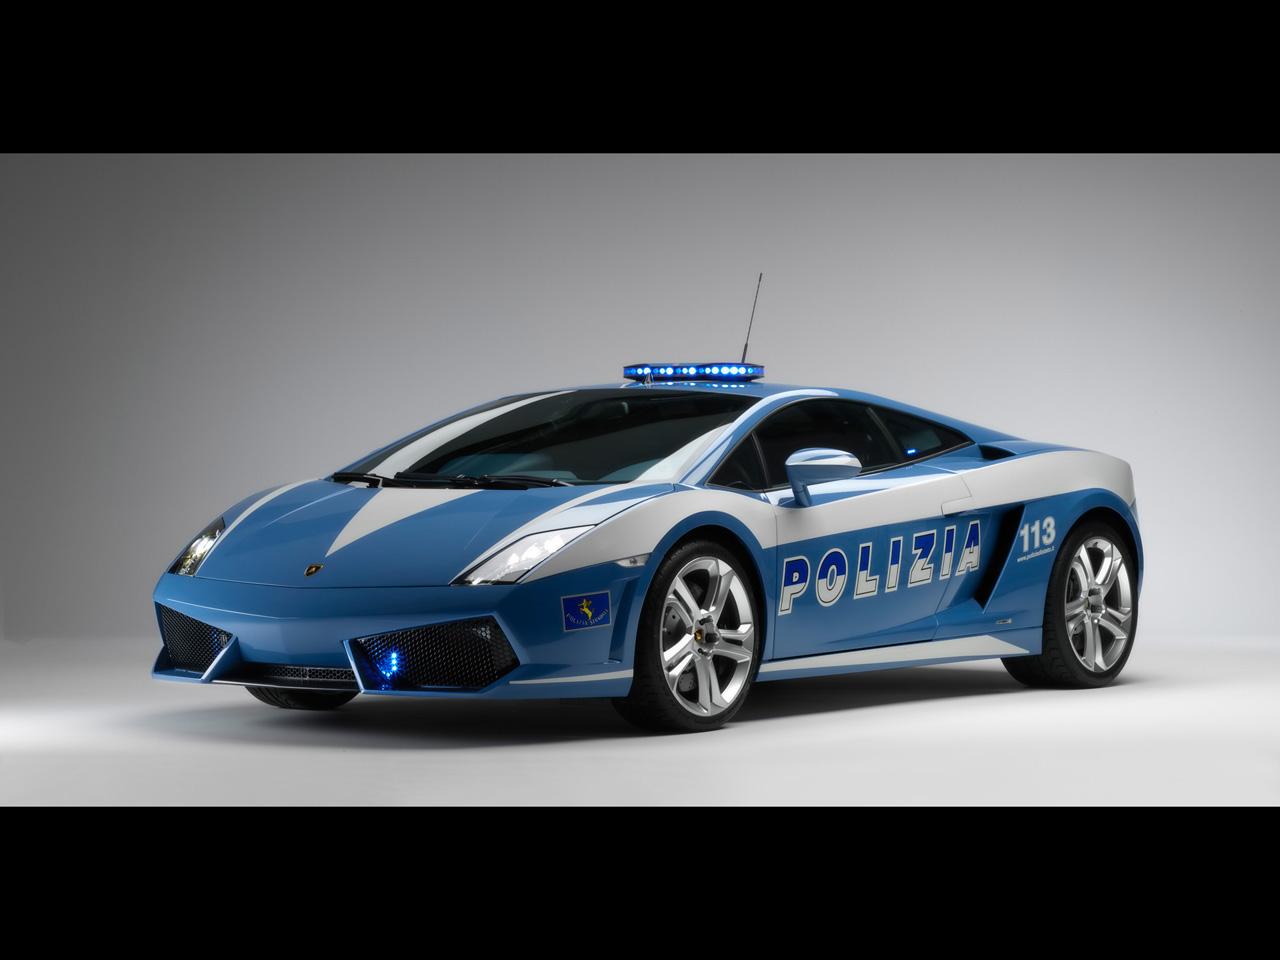 2009 Lamborghini Gallardo LP560-4 Polizia Wallpapers in High ...